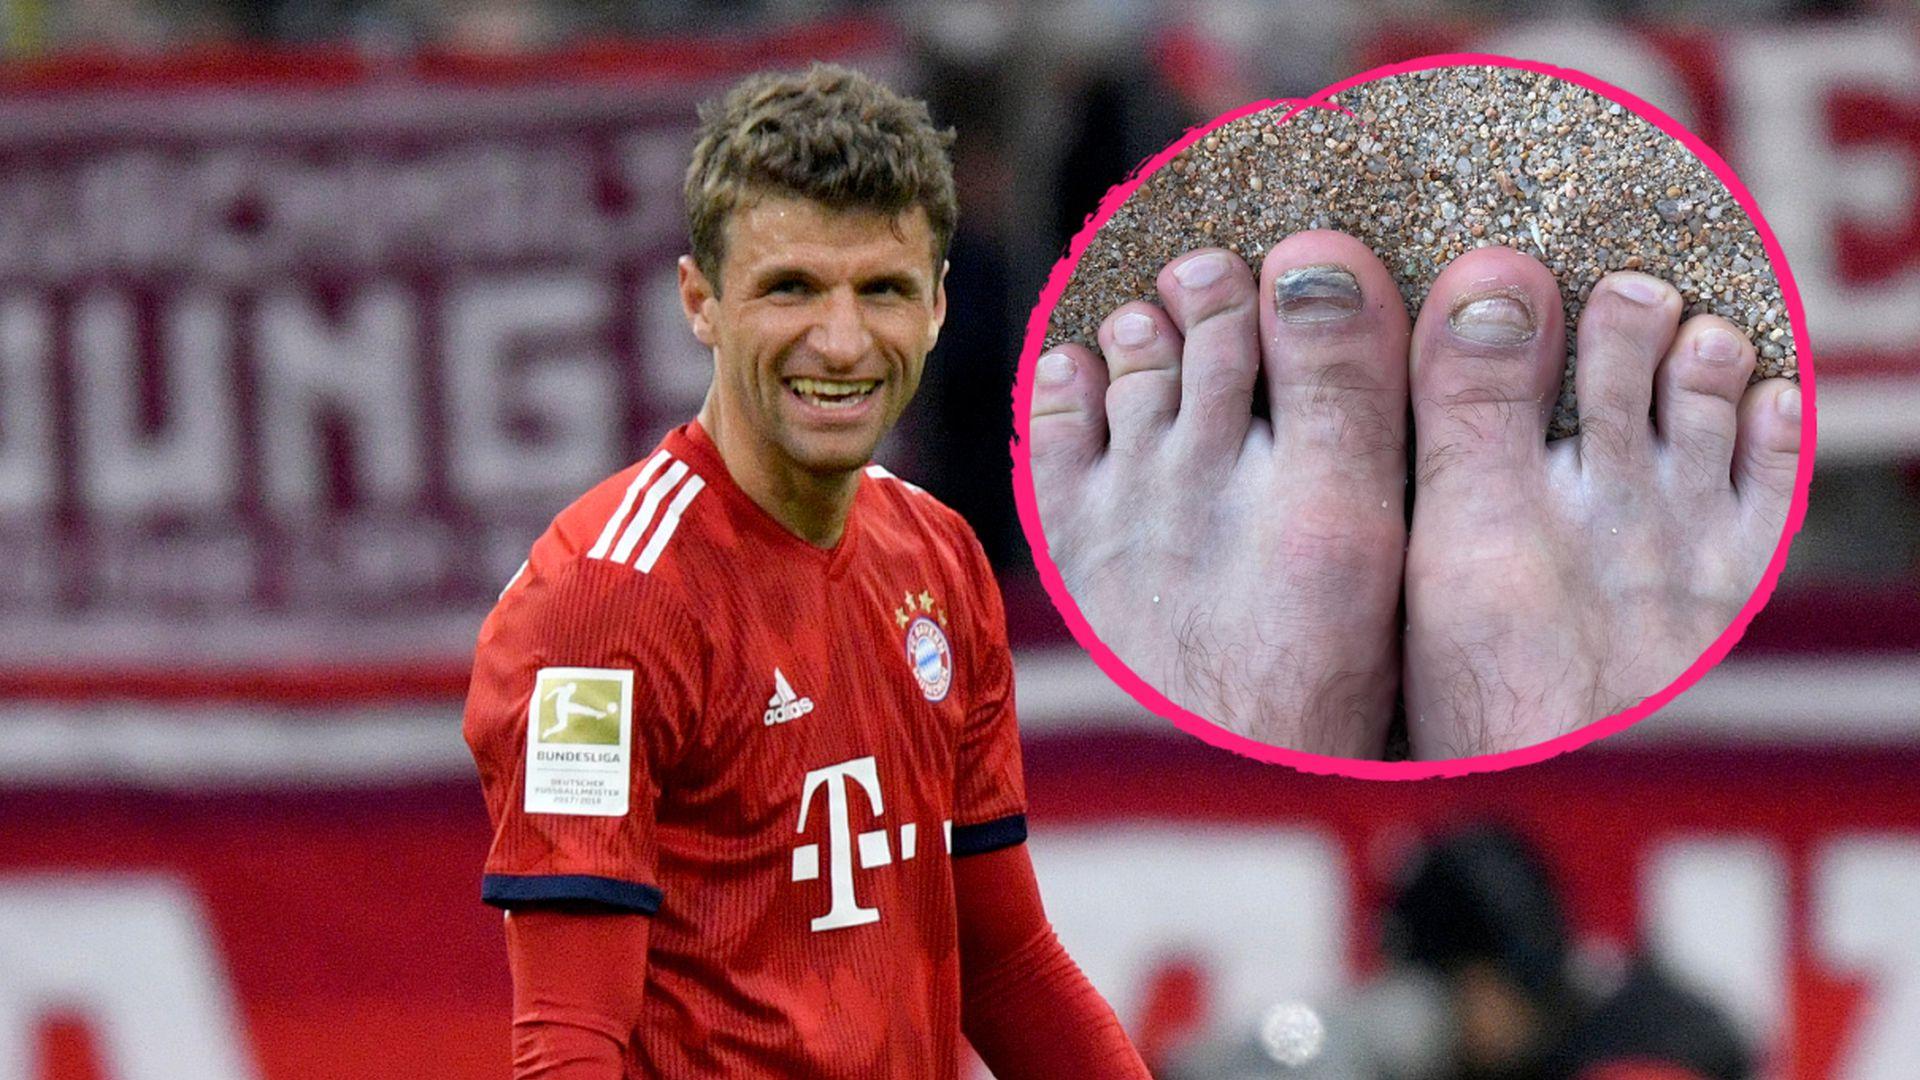 Kickerleiden: Thomas Müller witzelt über kaputte Fußnägel